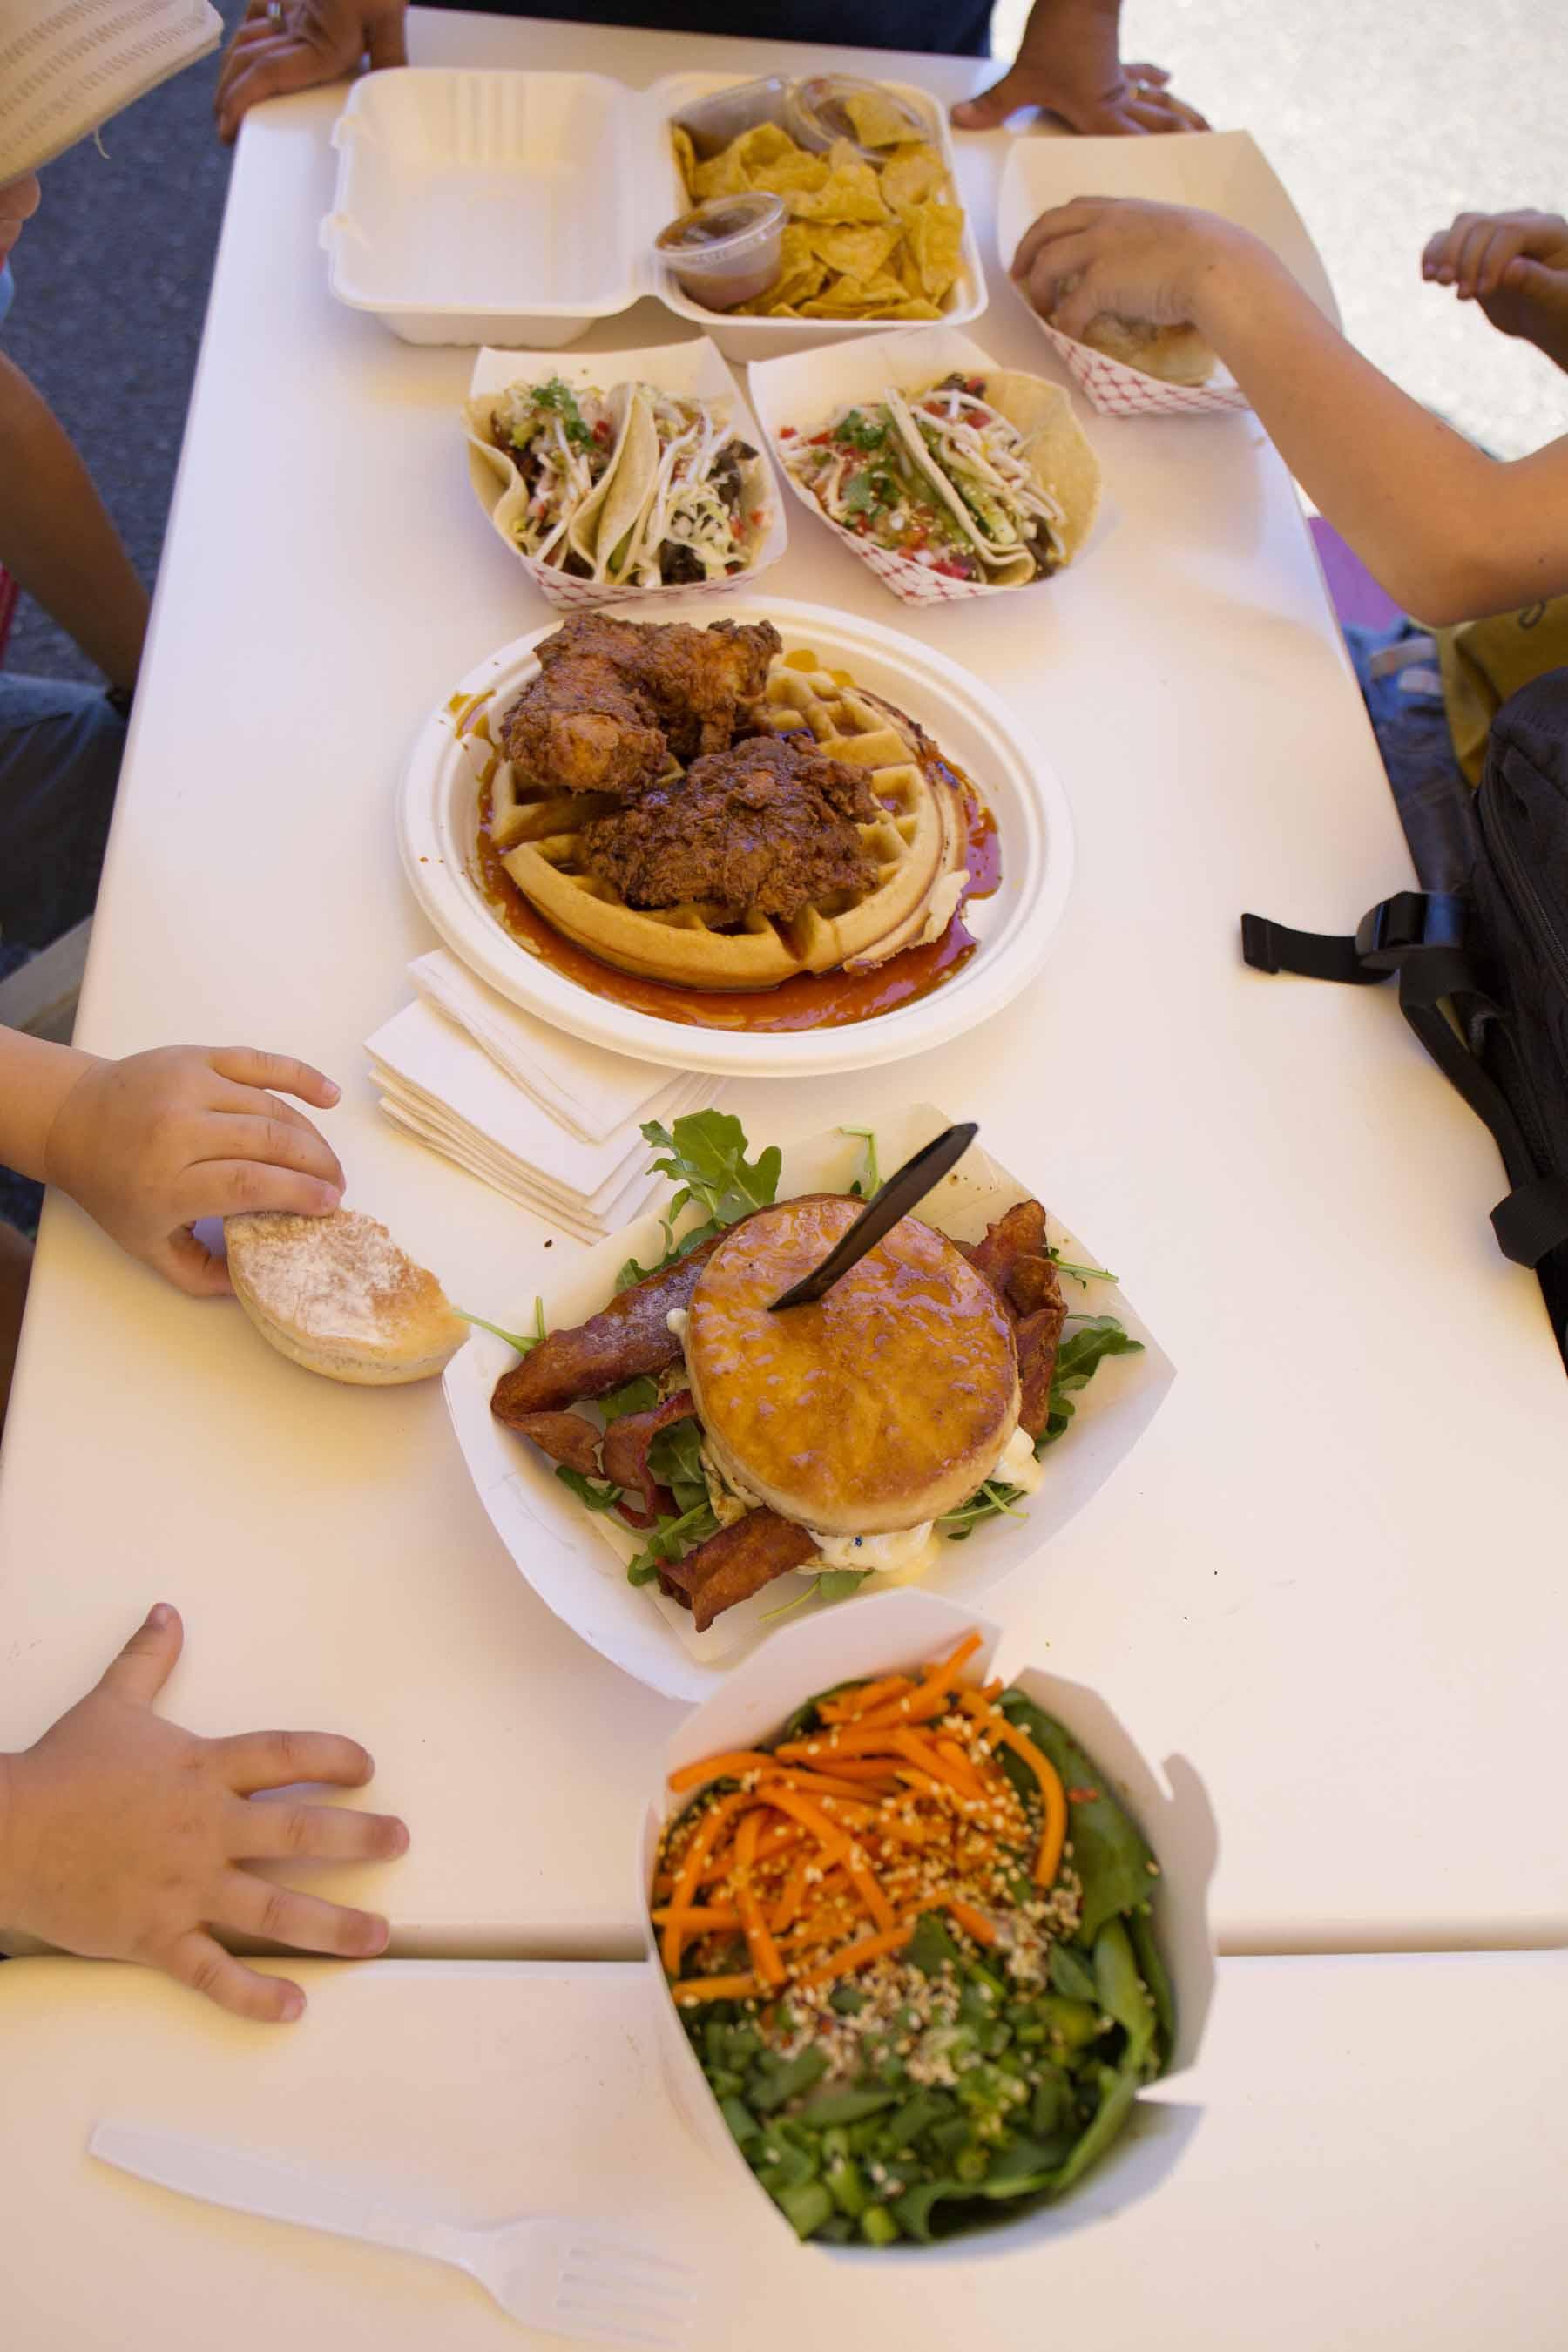 Food truck feast